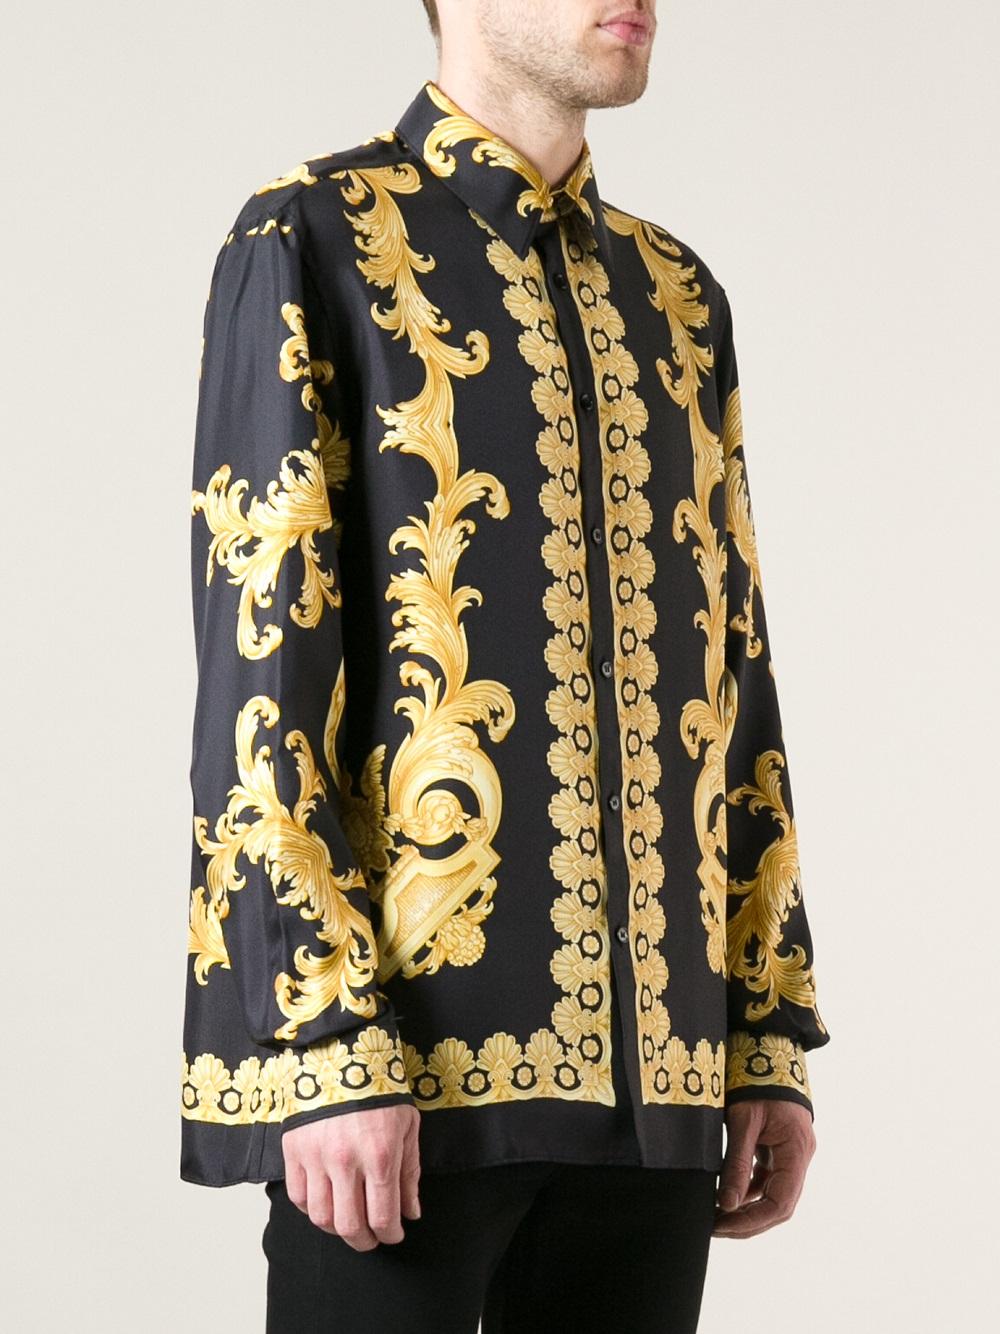 Lyst - Versace Baroque Print Shirt in Black for Men